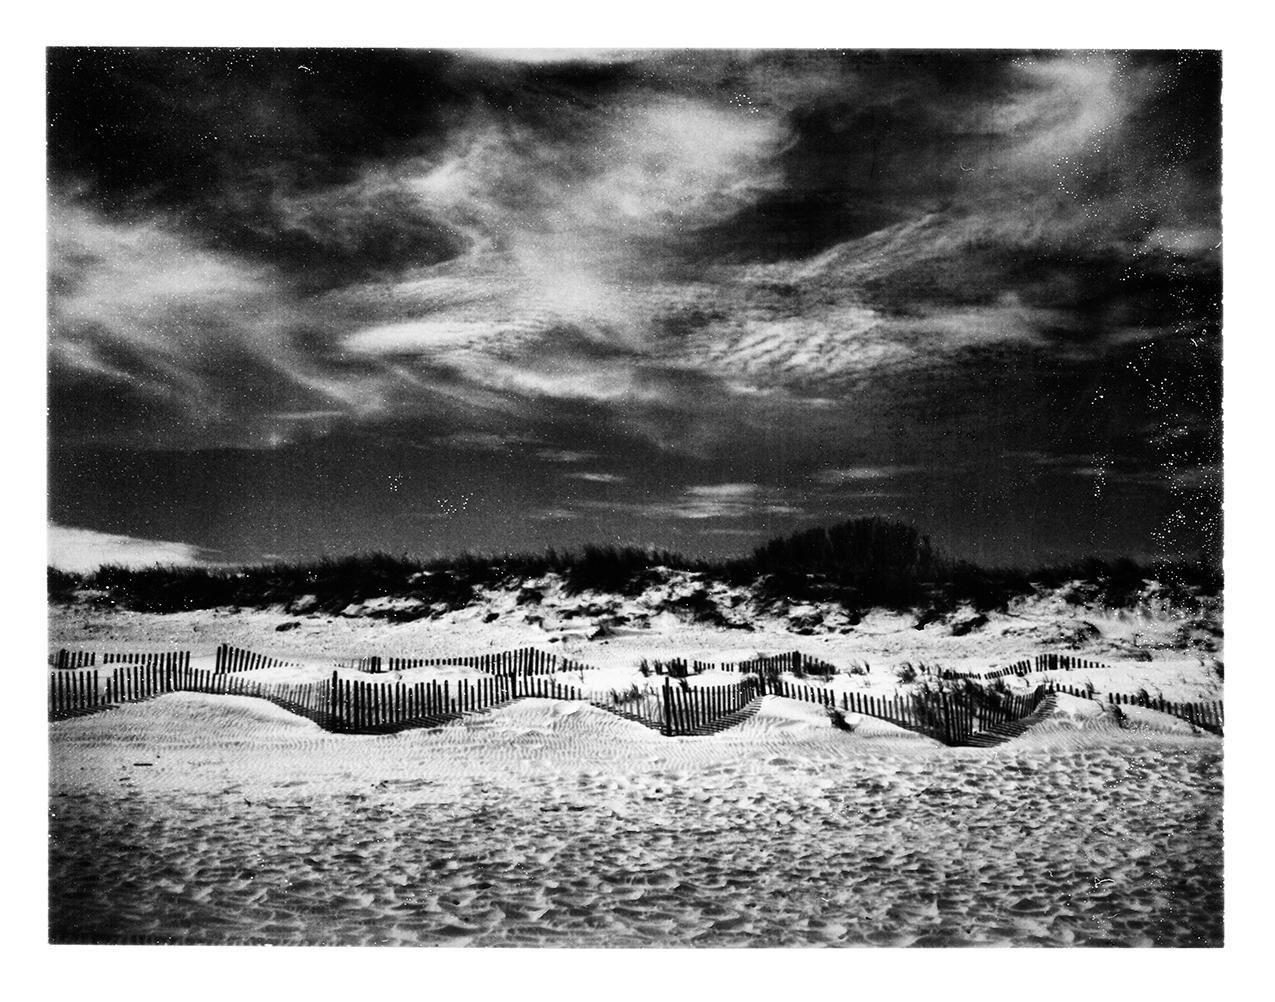 Seaside Dunes | Polaroid Land Camera 250 | Fuji FP300B | Keith Mendenhall